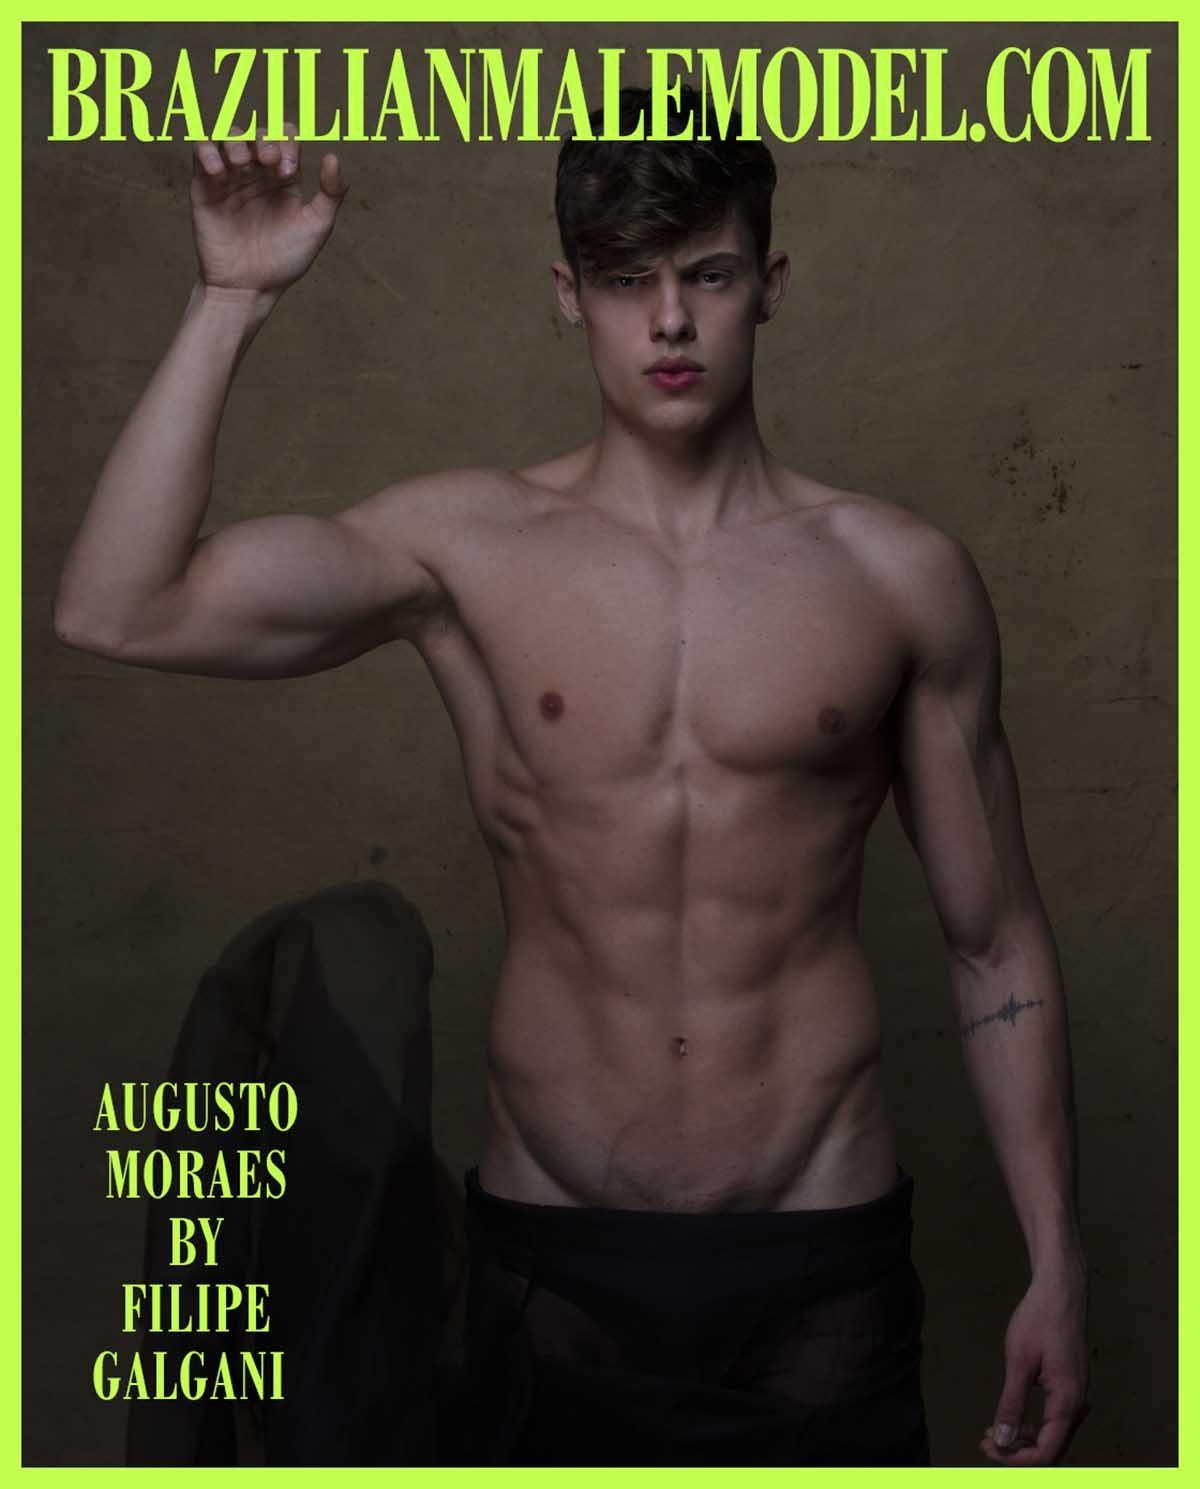 Augusto Moraes by Filipe Galgani